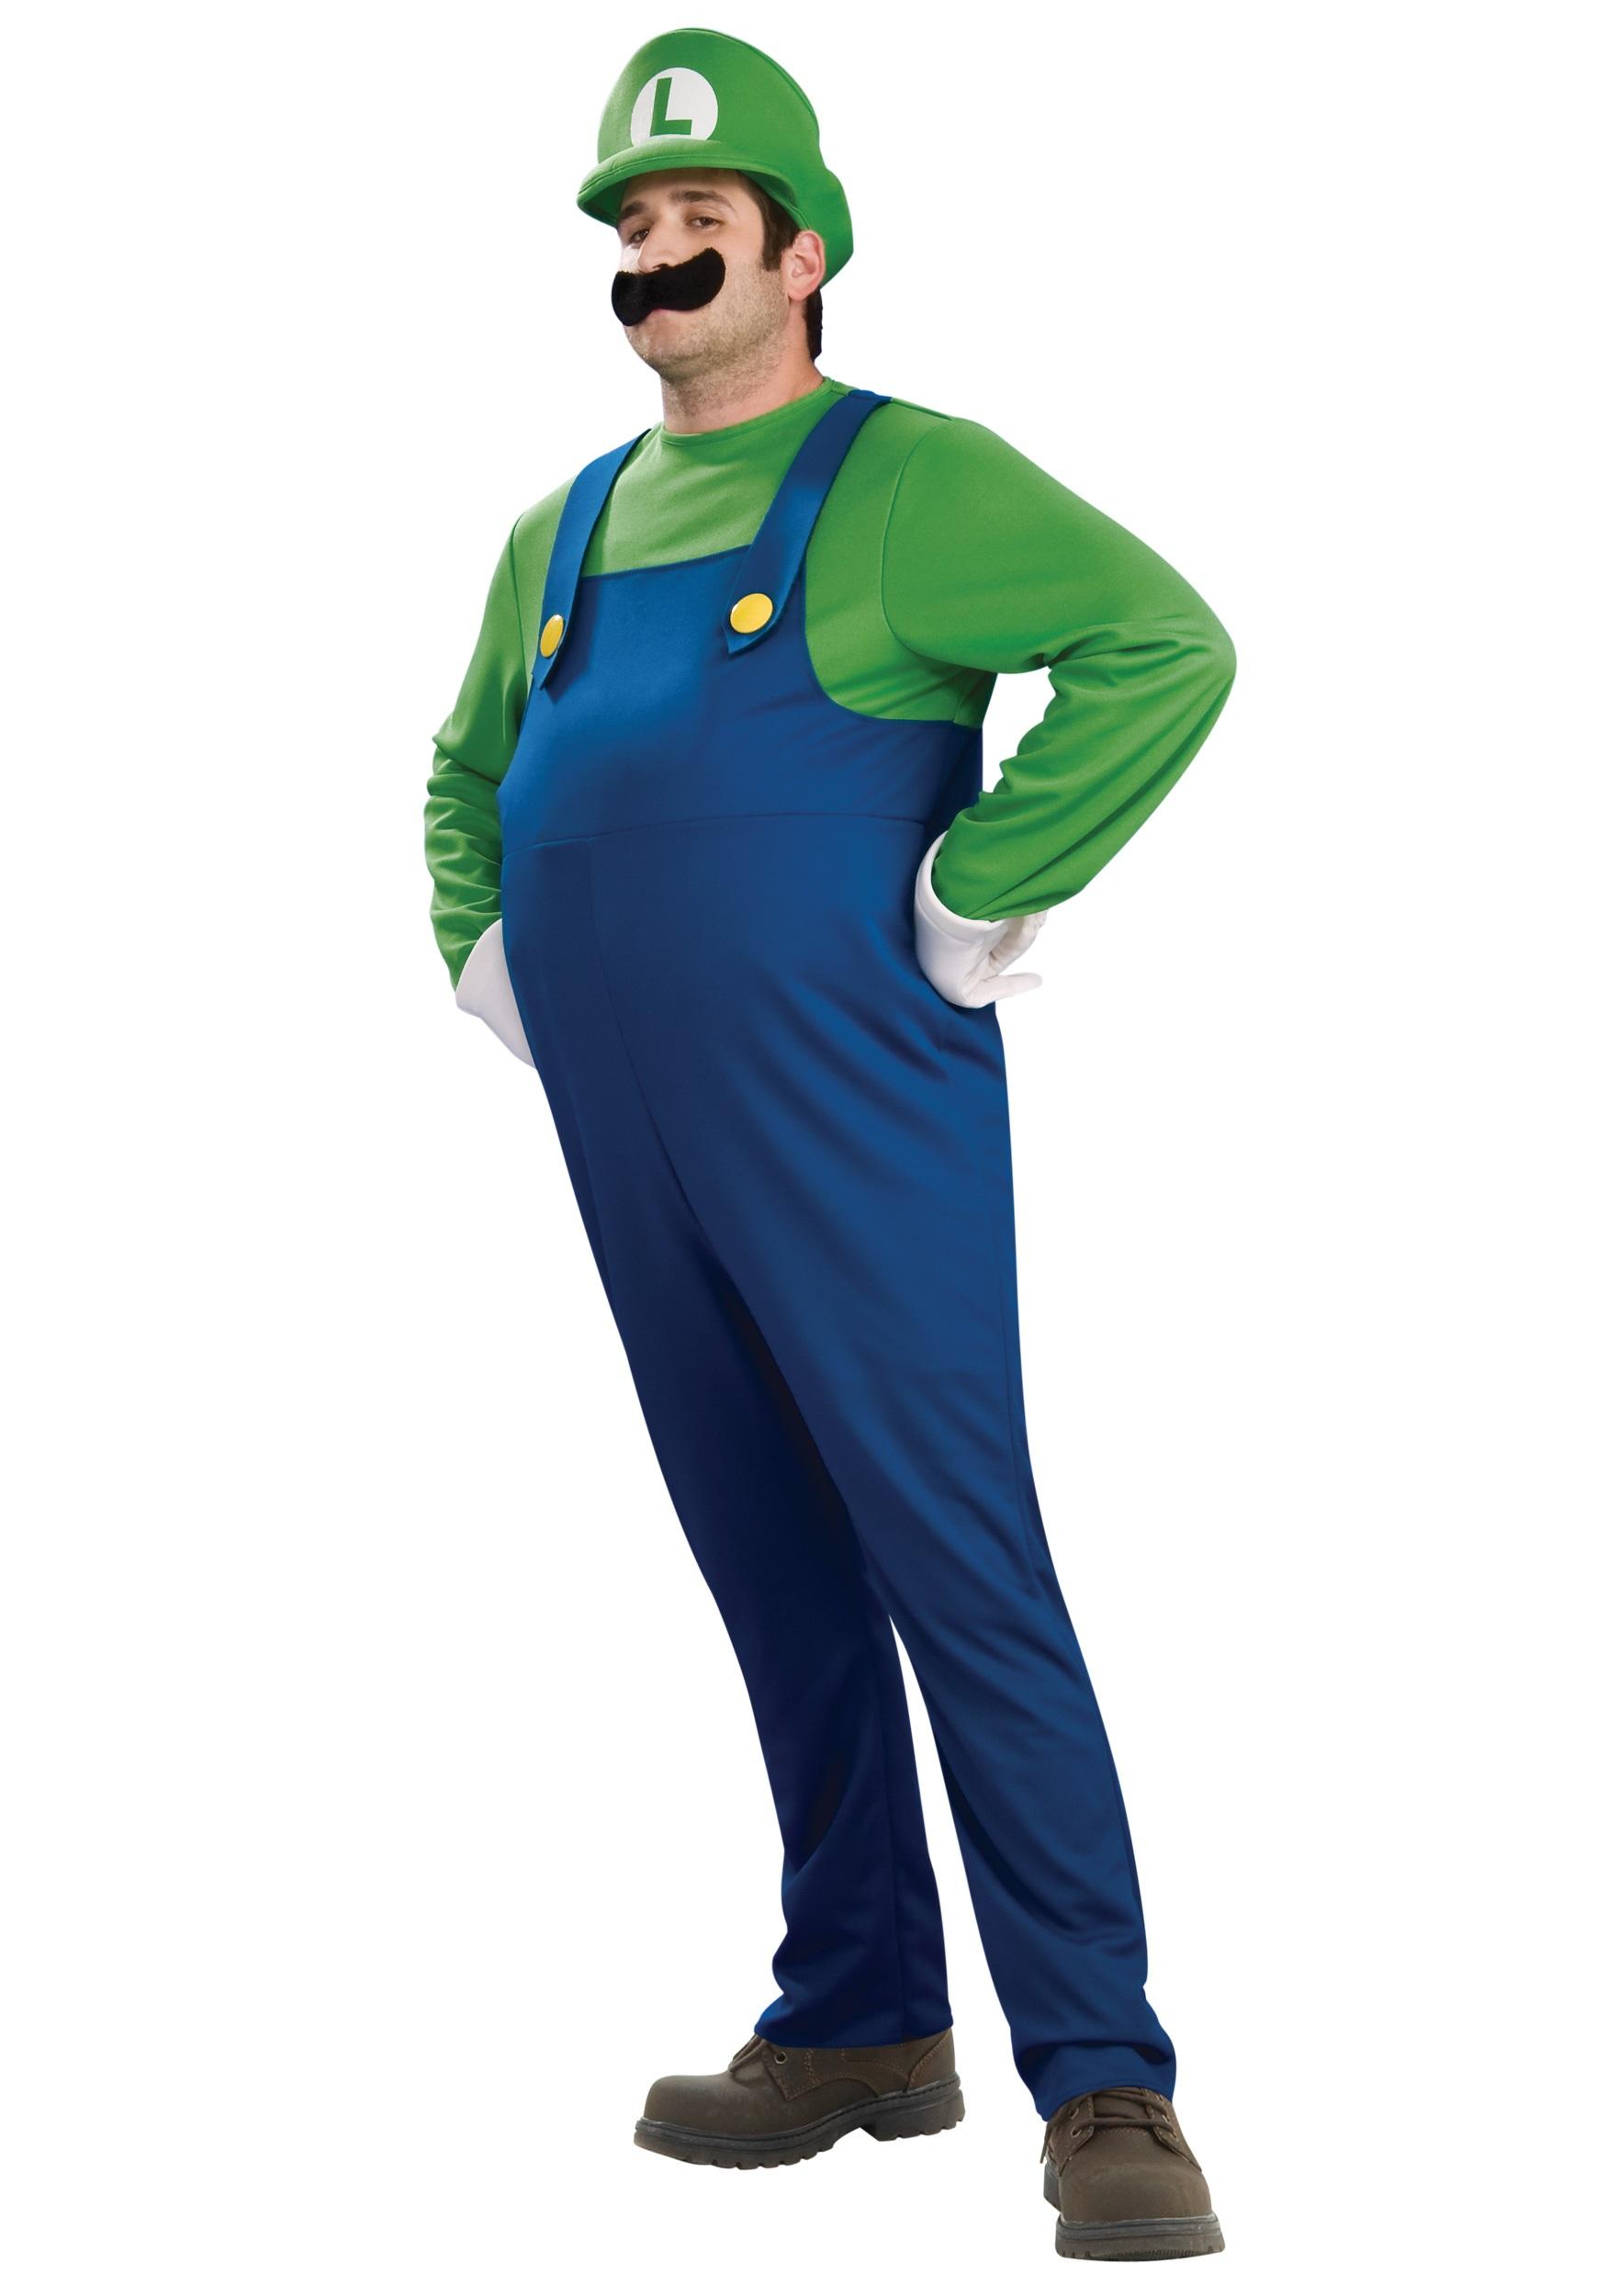 Adult Deluxe Luigi Costume Halloween Costume Ideas 2019